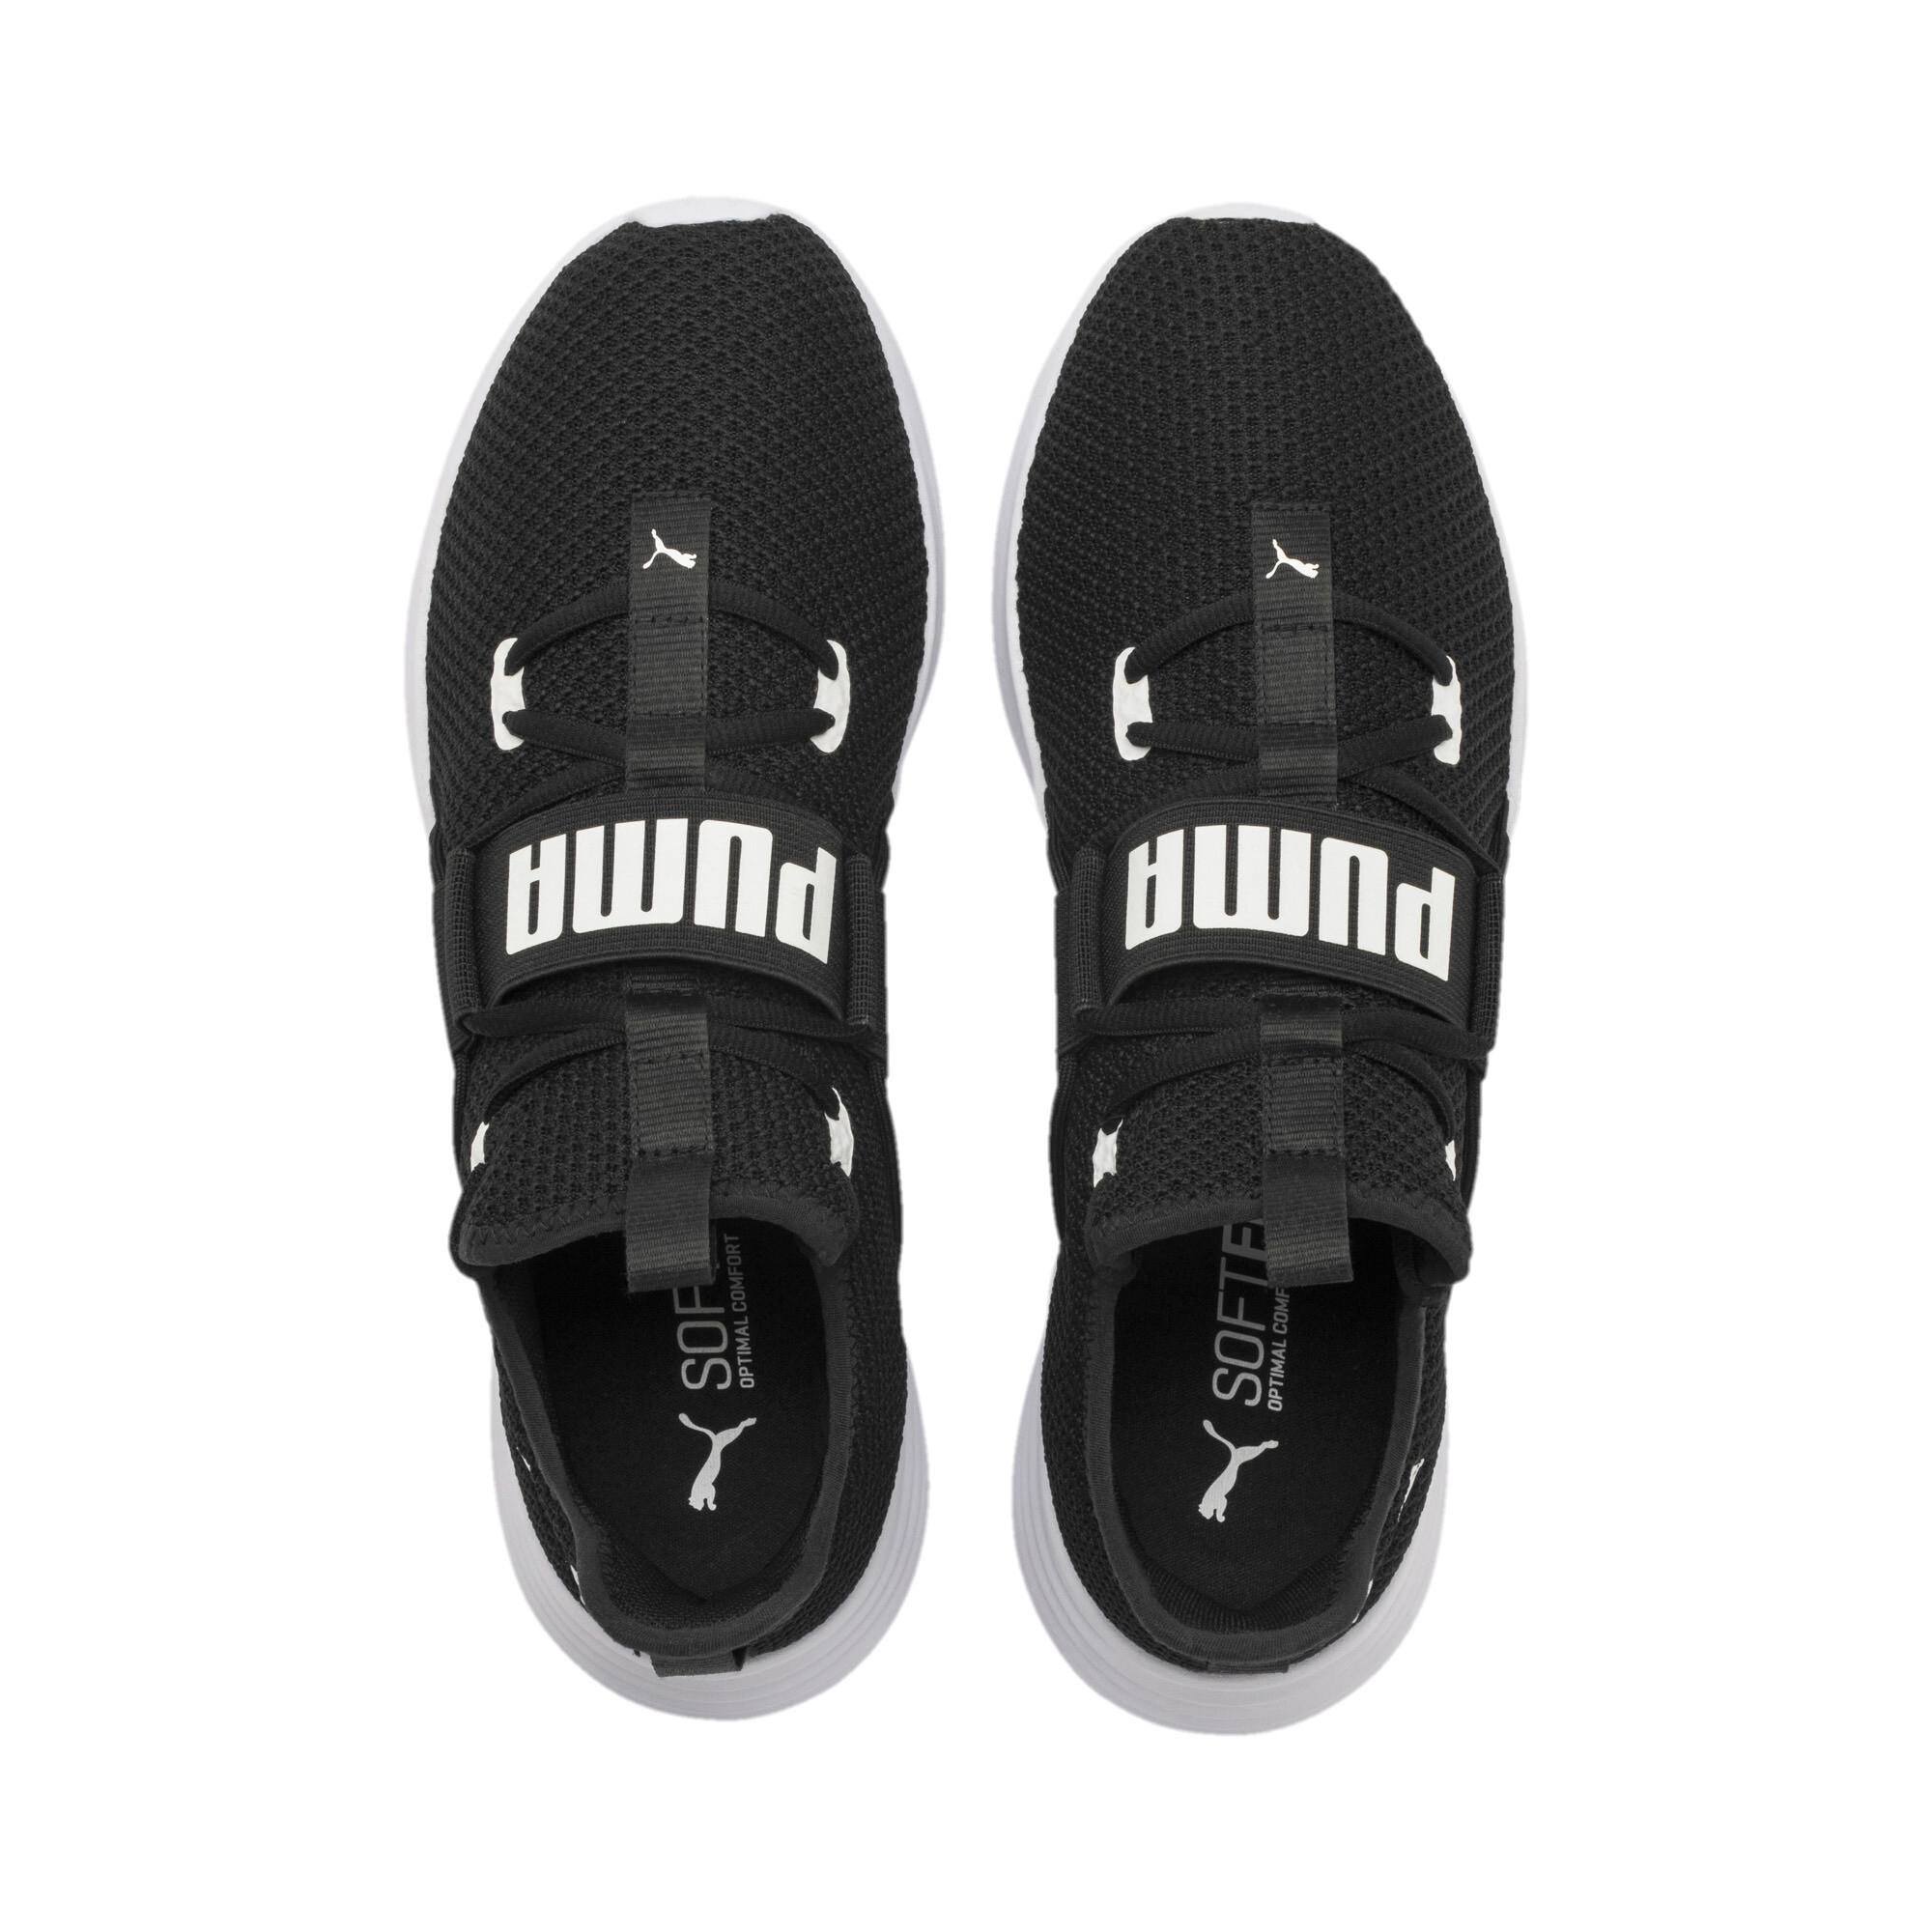 PUMA-Men-039-s-Persist-XT-Knit-Training-Shoes thumbnail 8